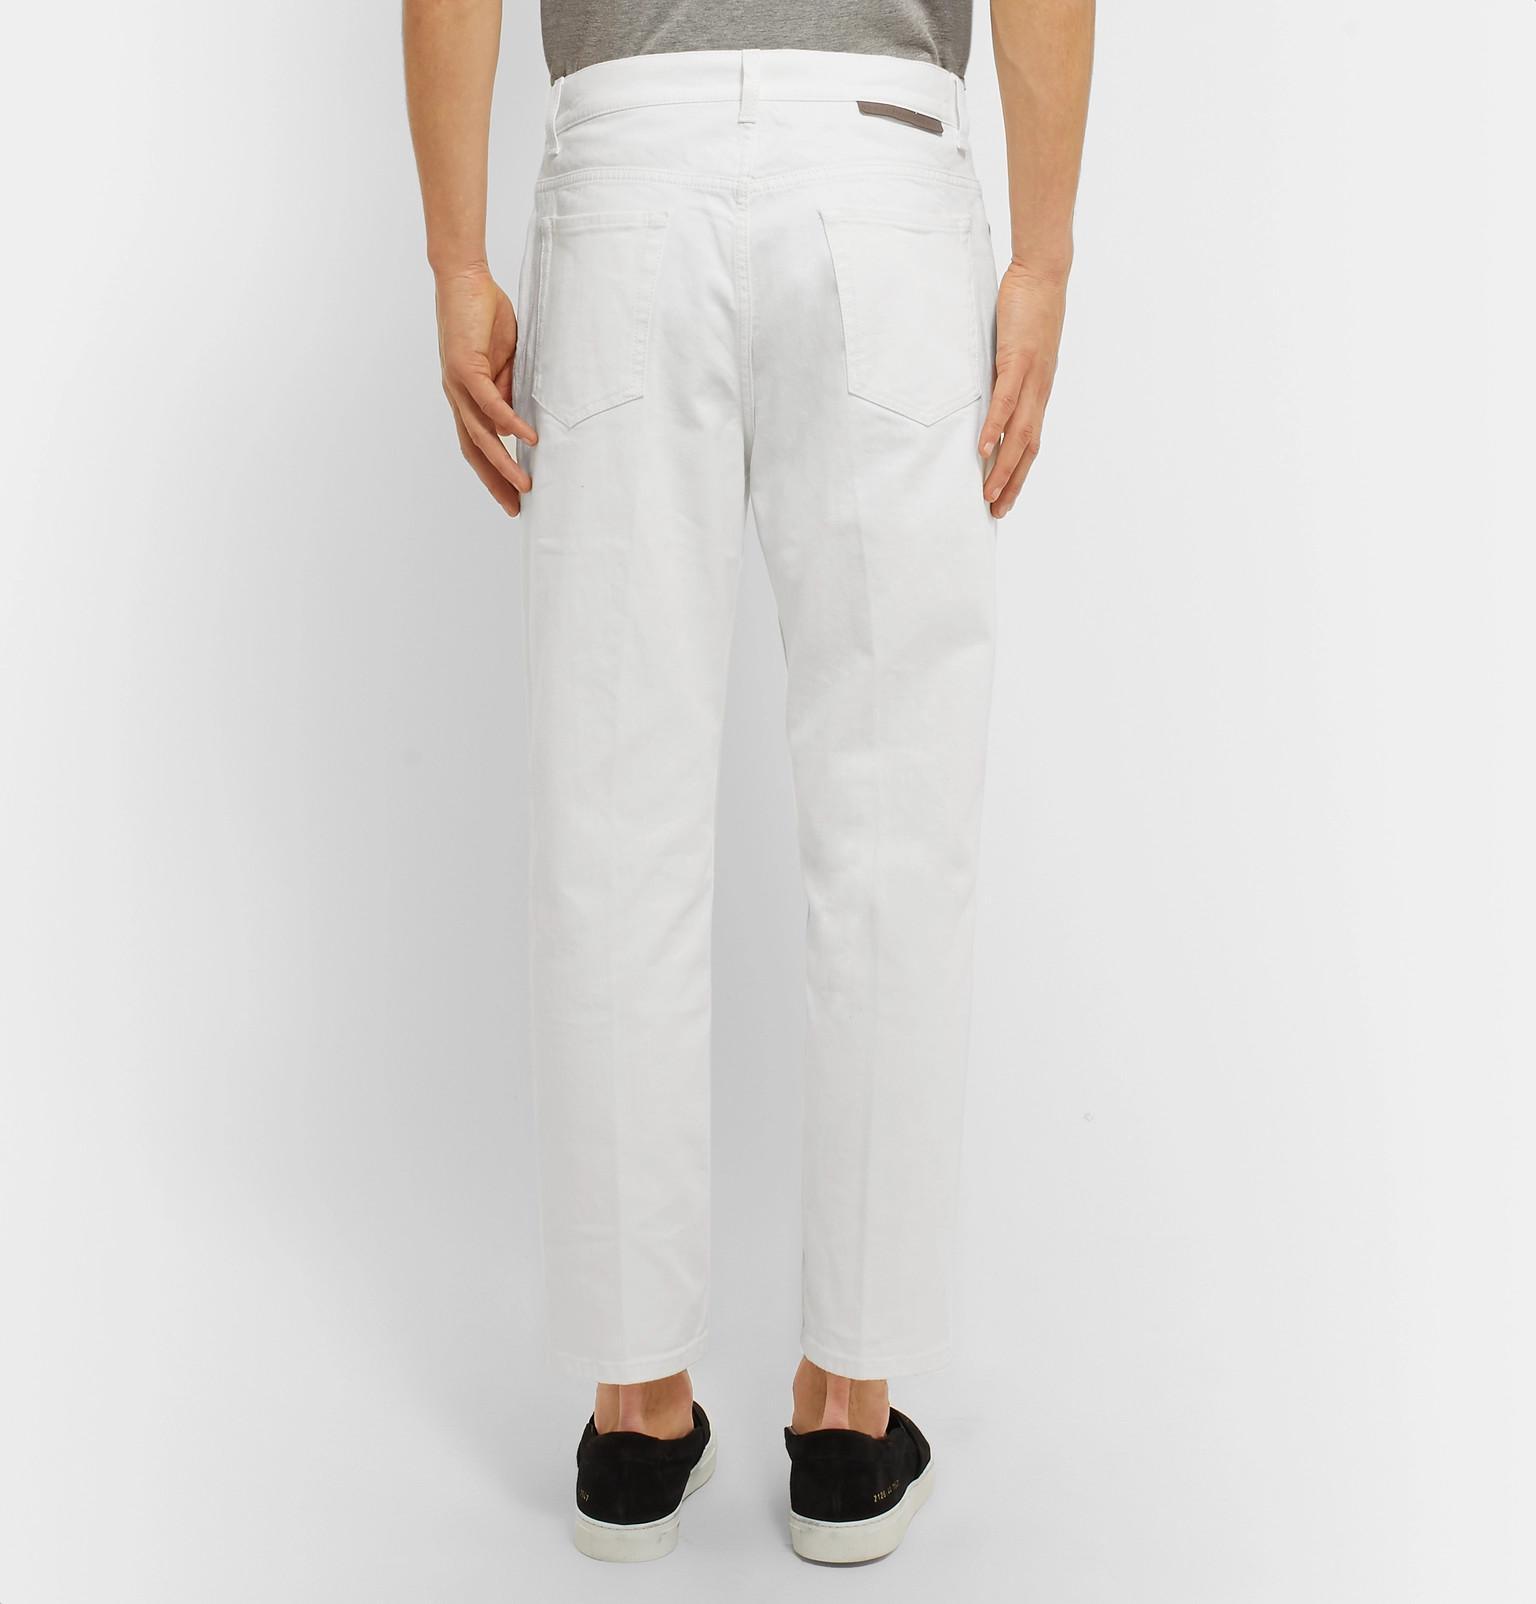 Stella McCartney Cropped Tapered Denim Jeans in White for Men